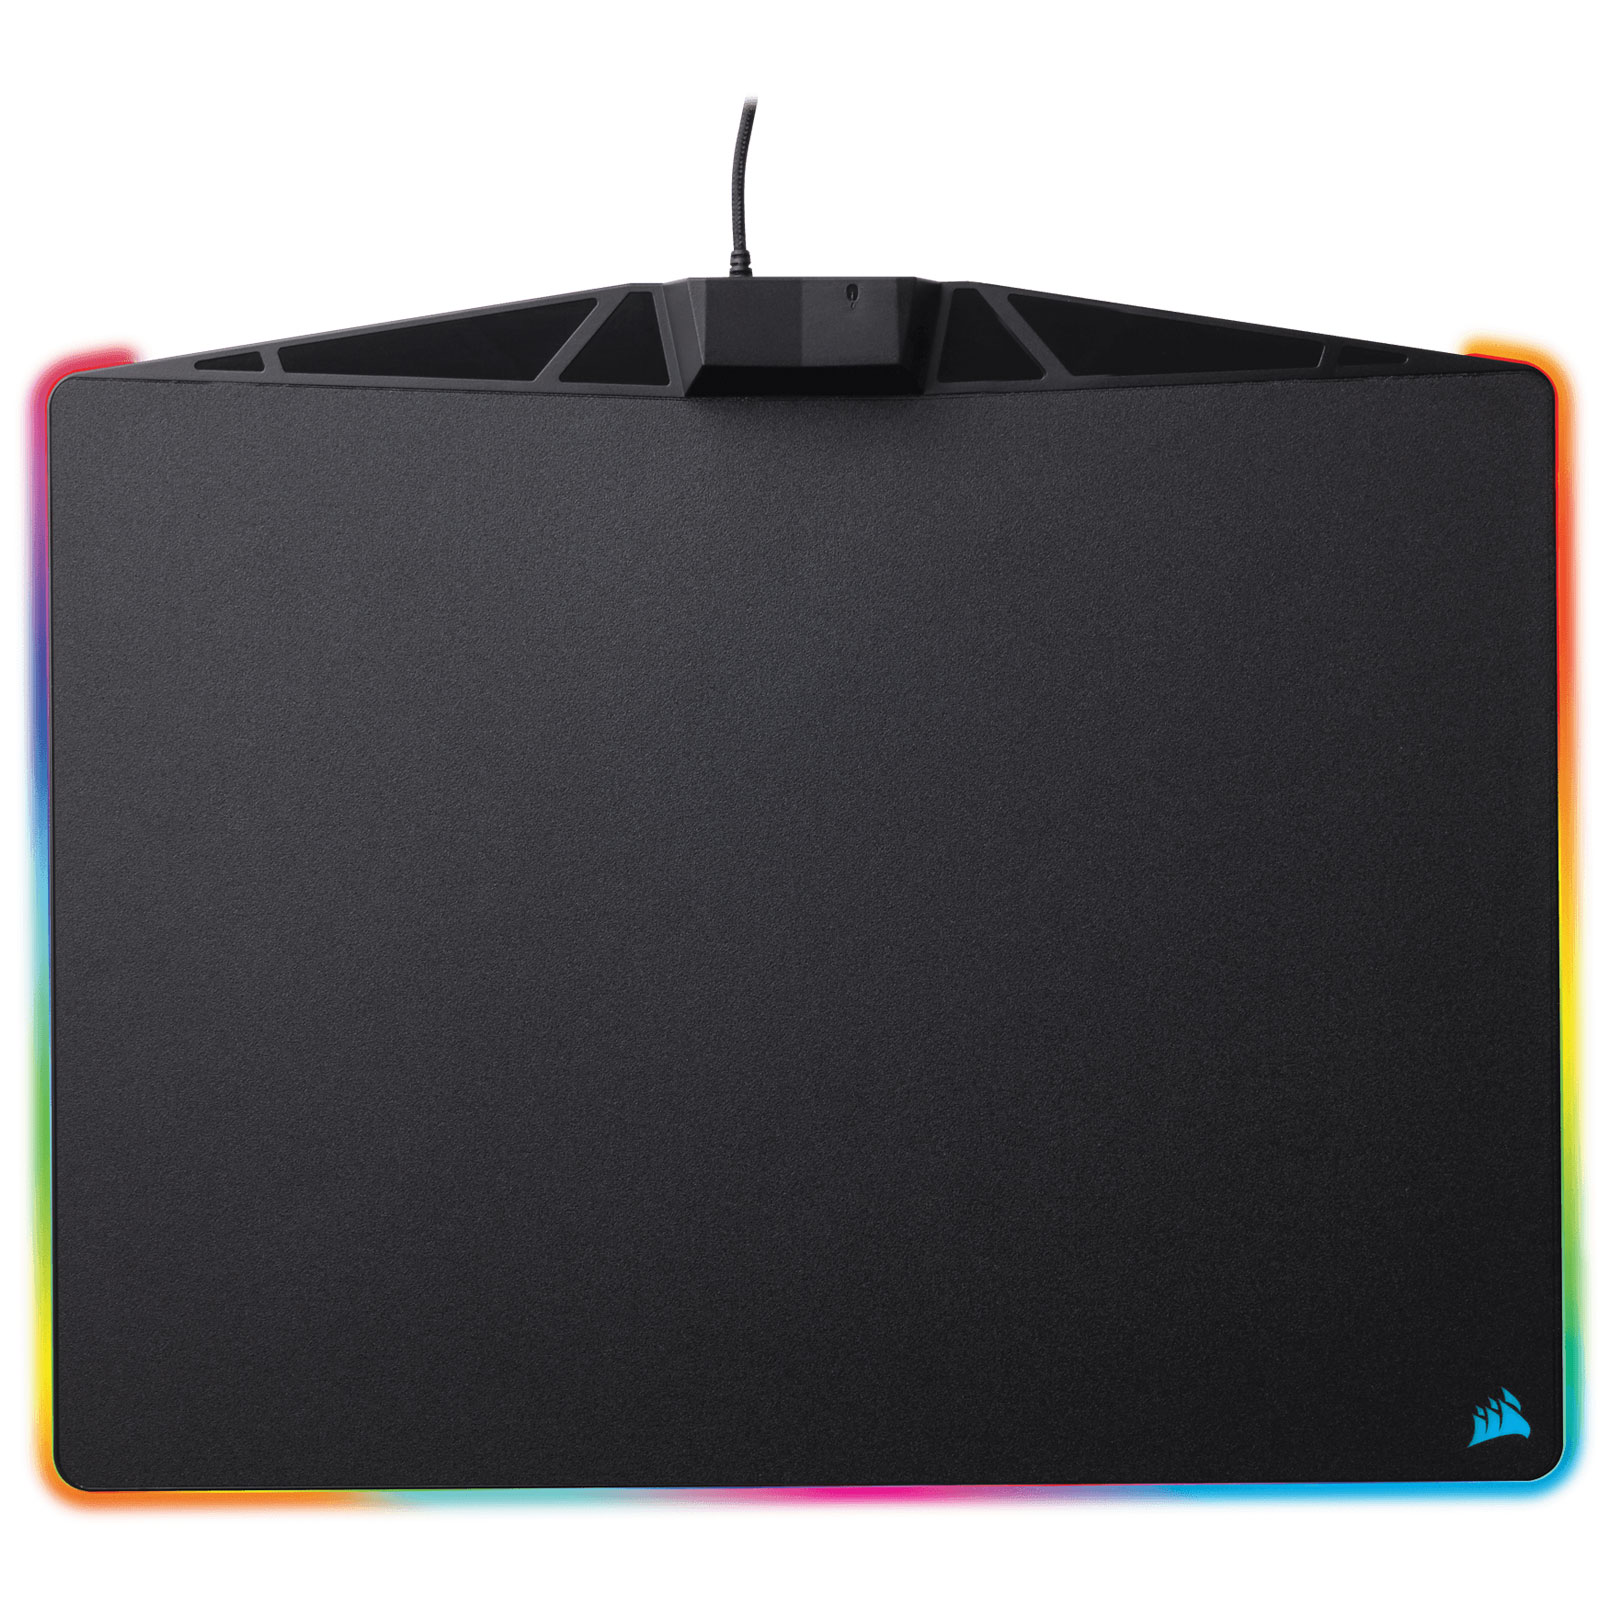 Corsair MM800 RGB POLARIS - - Tapis de souris Corsair - 1